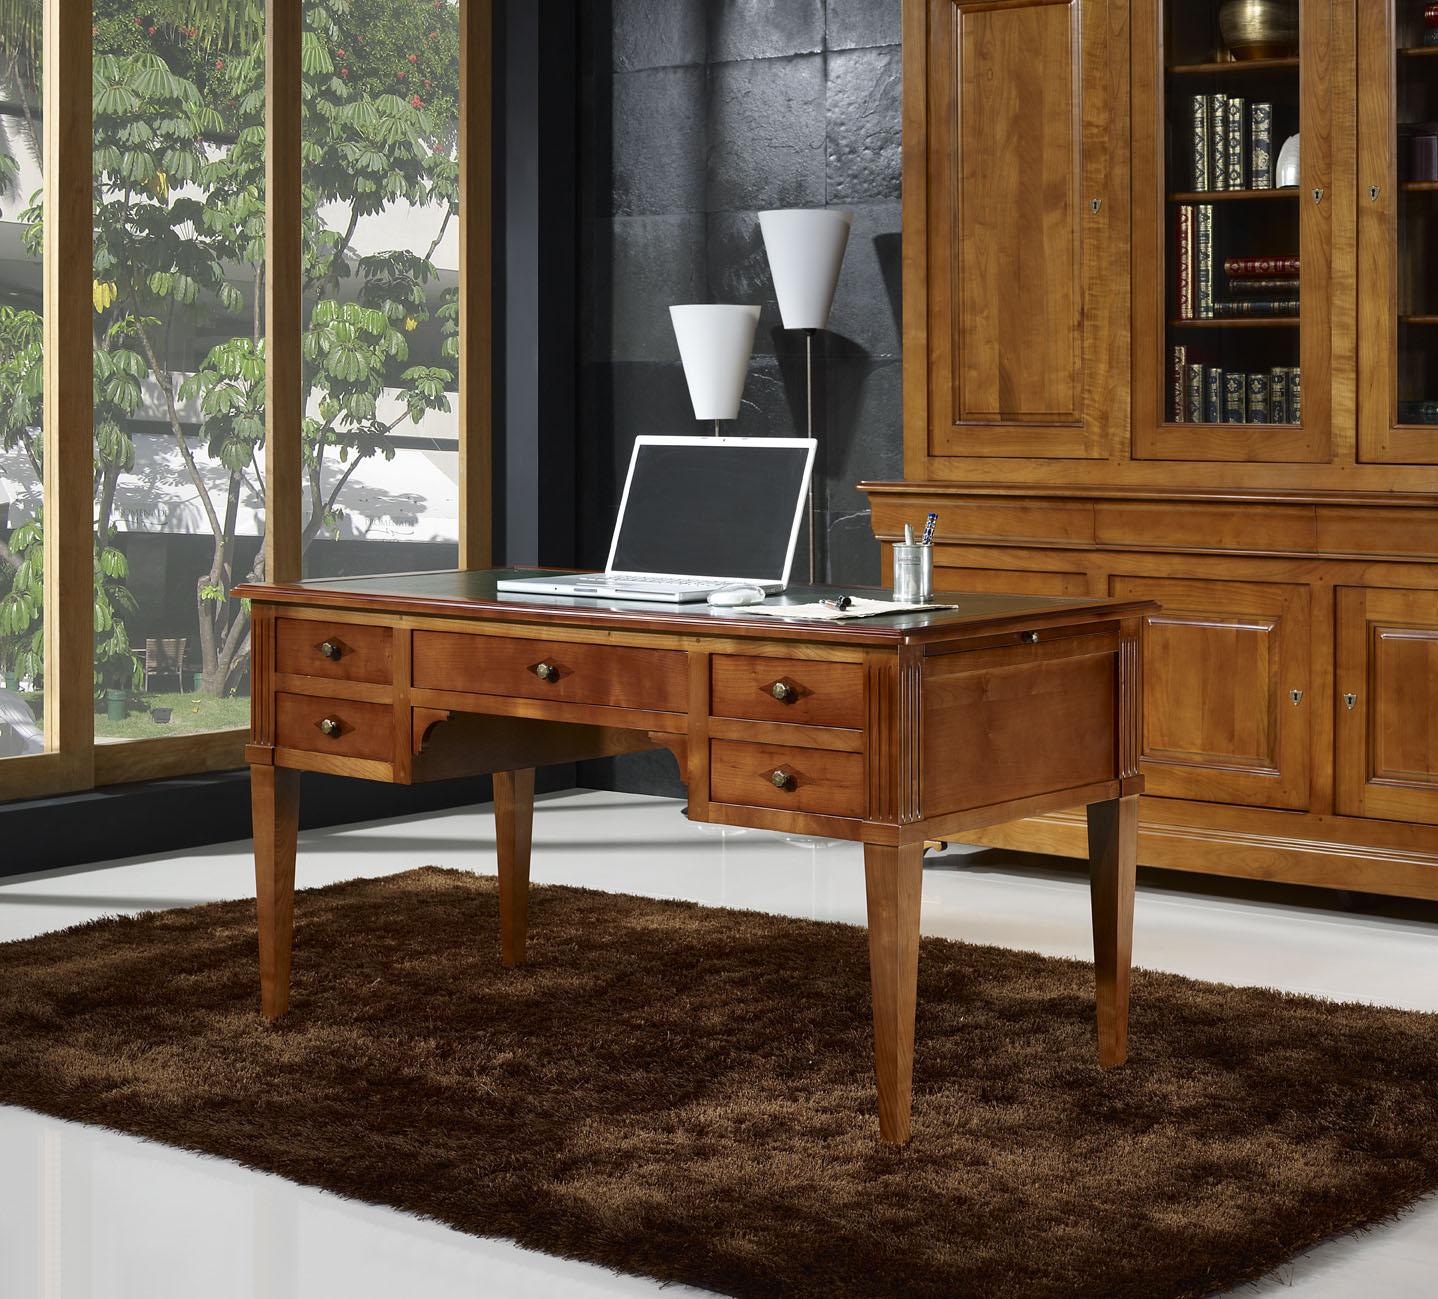 bureau ministre en merisier massif de style directoire meuble en merisier. Black Bedroom Furniture Sets. Home Design Ideas